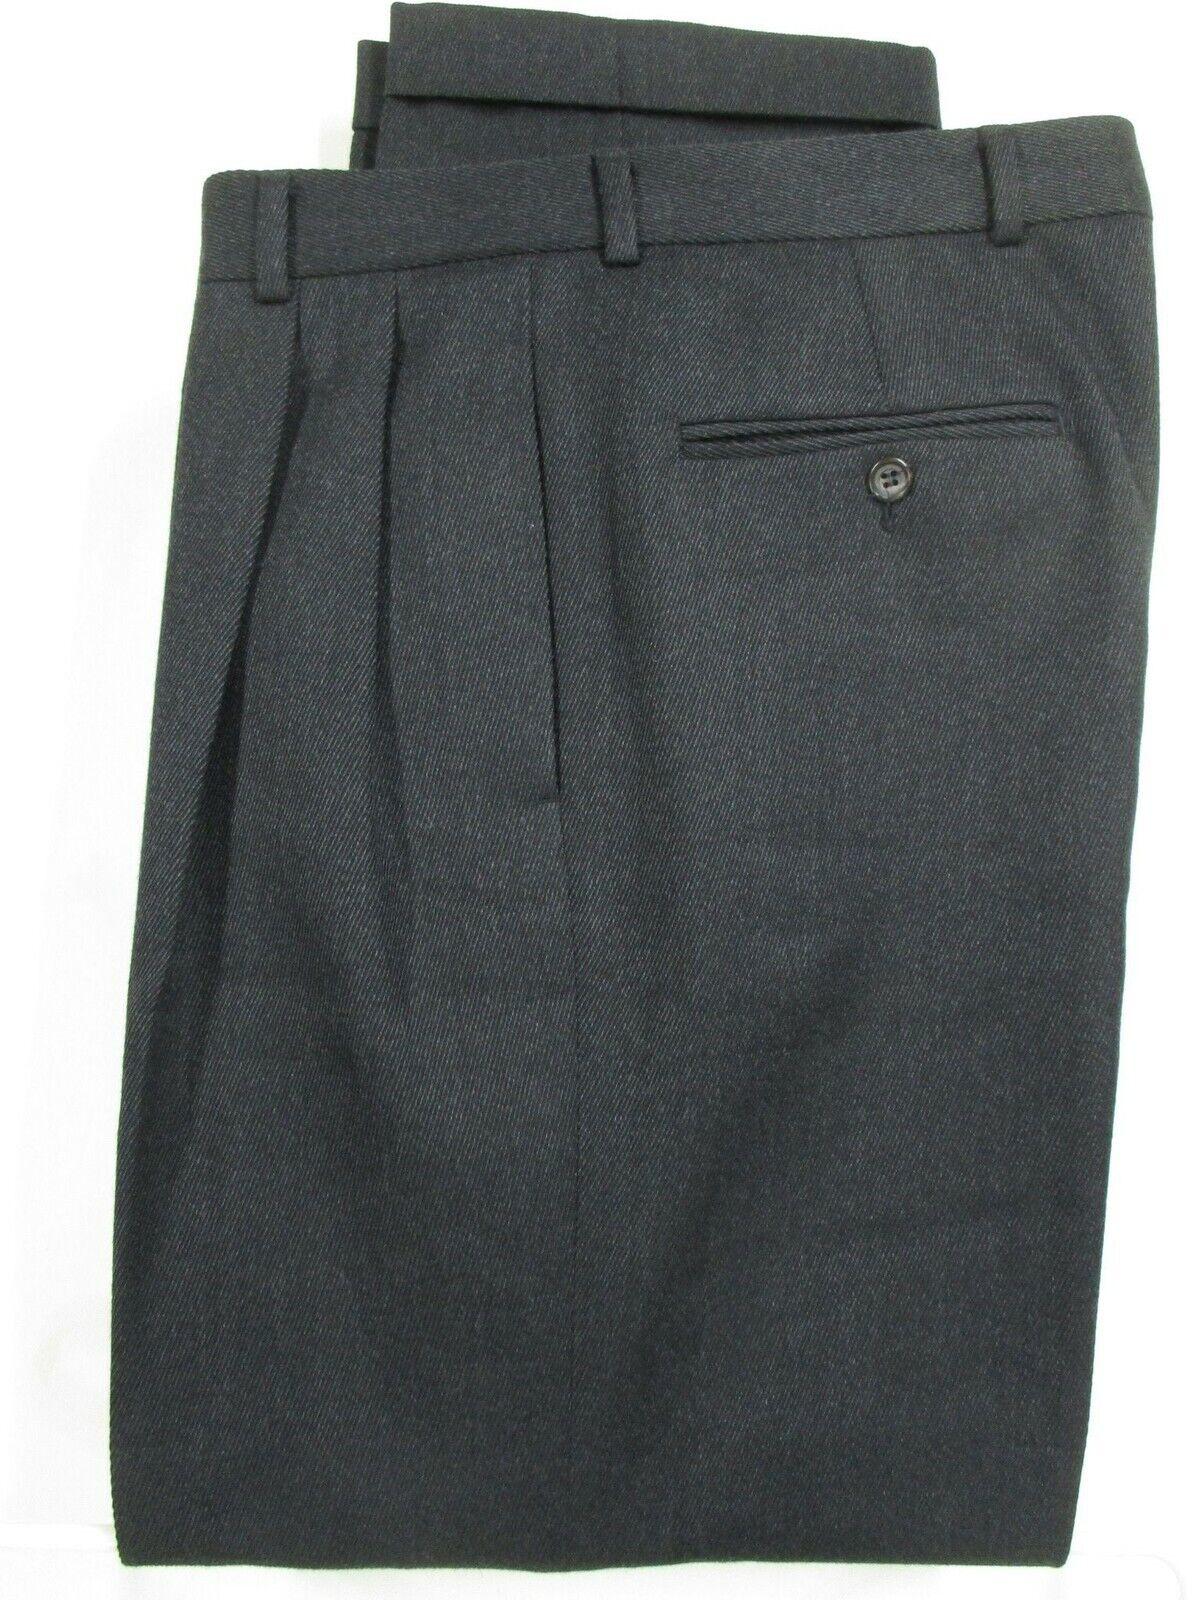 Brooks Bredhers Mens Charcoal Pleated Wool Dress Pants 34x30.5 USA Made